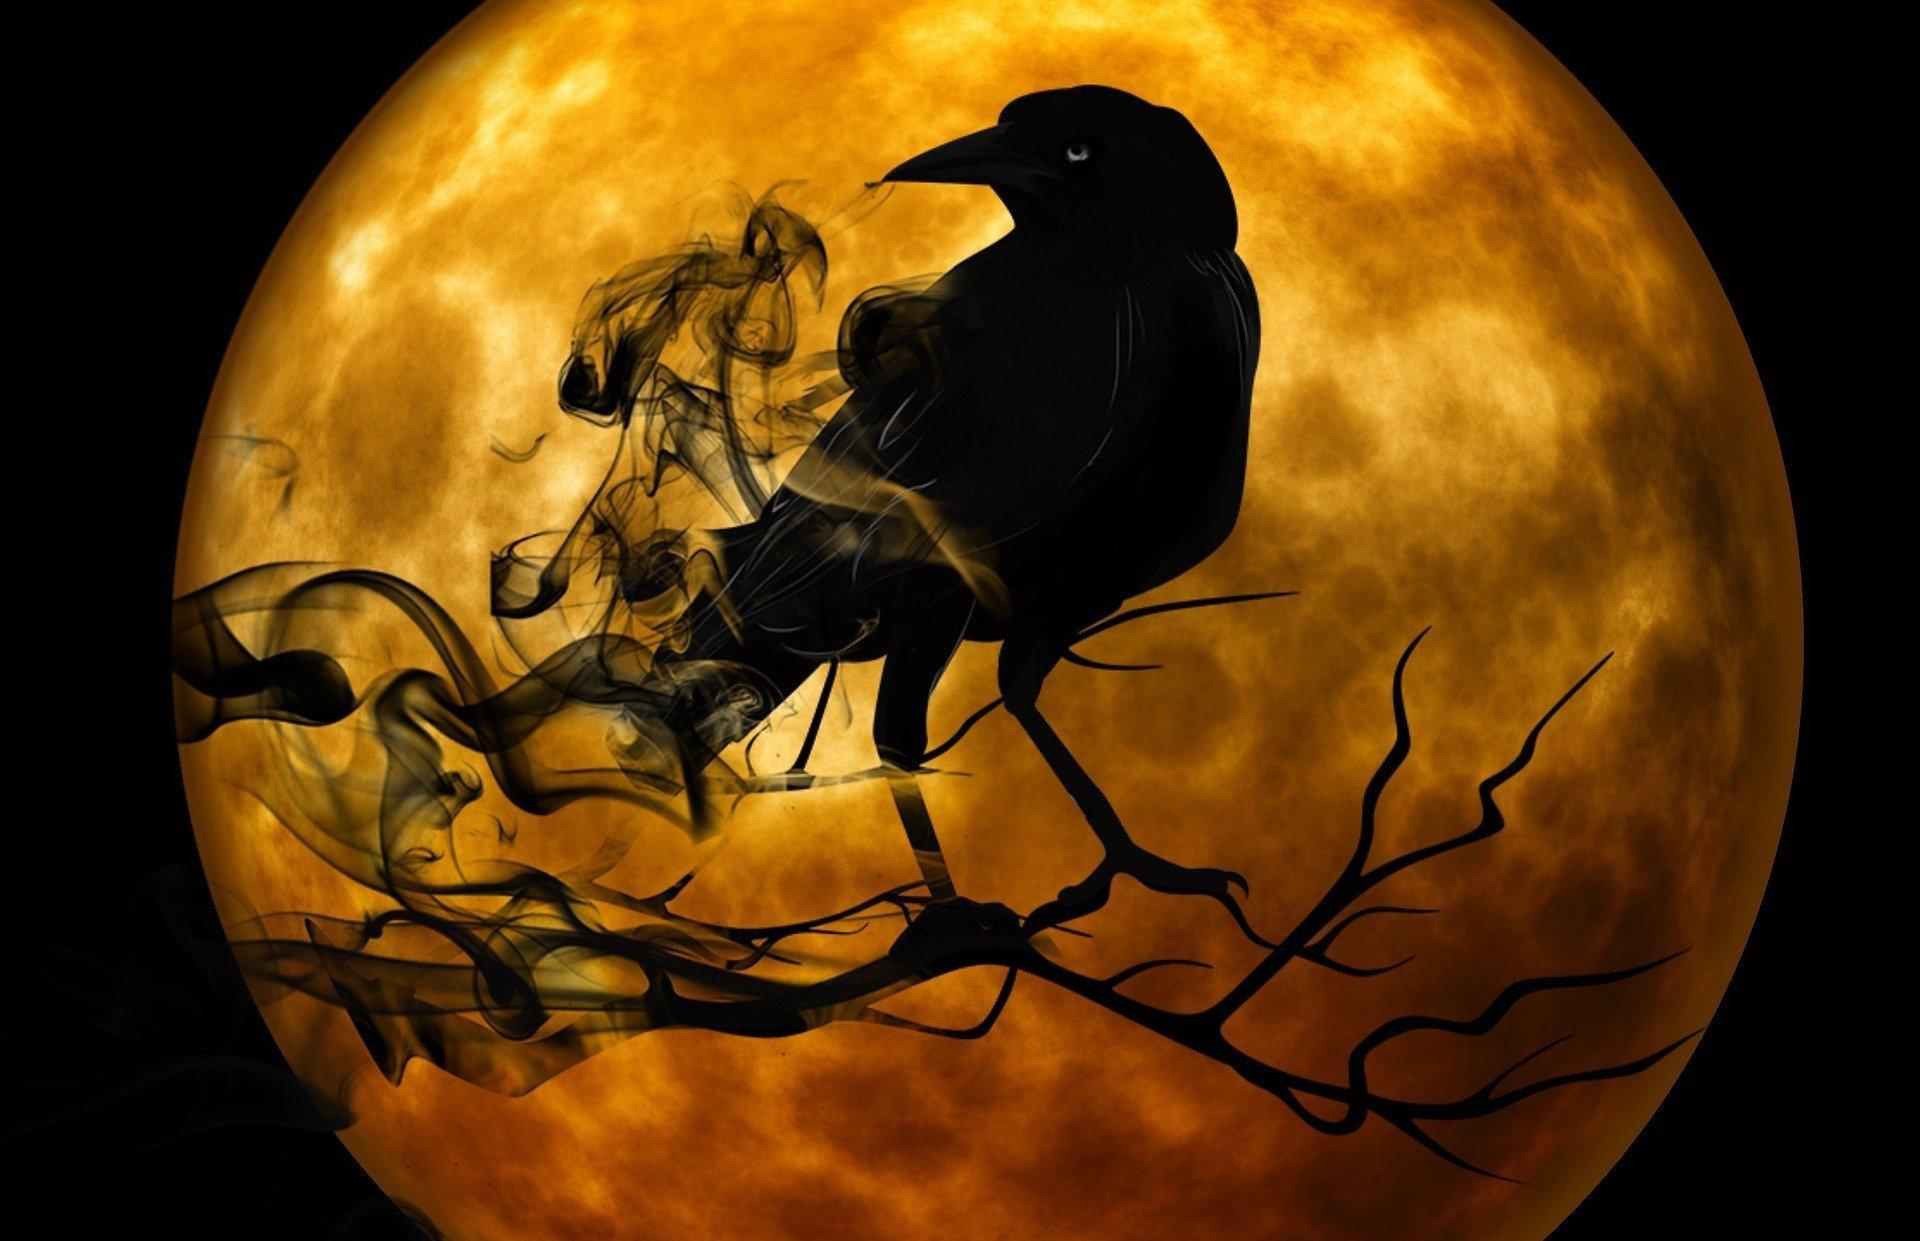 black raven against yellow moon